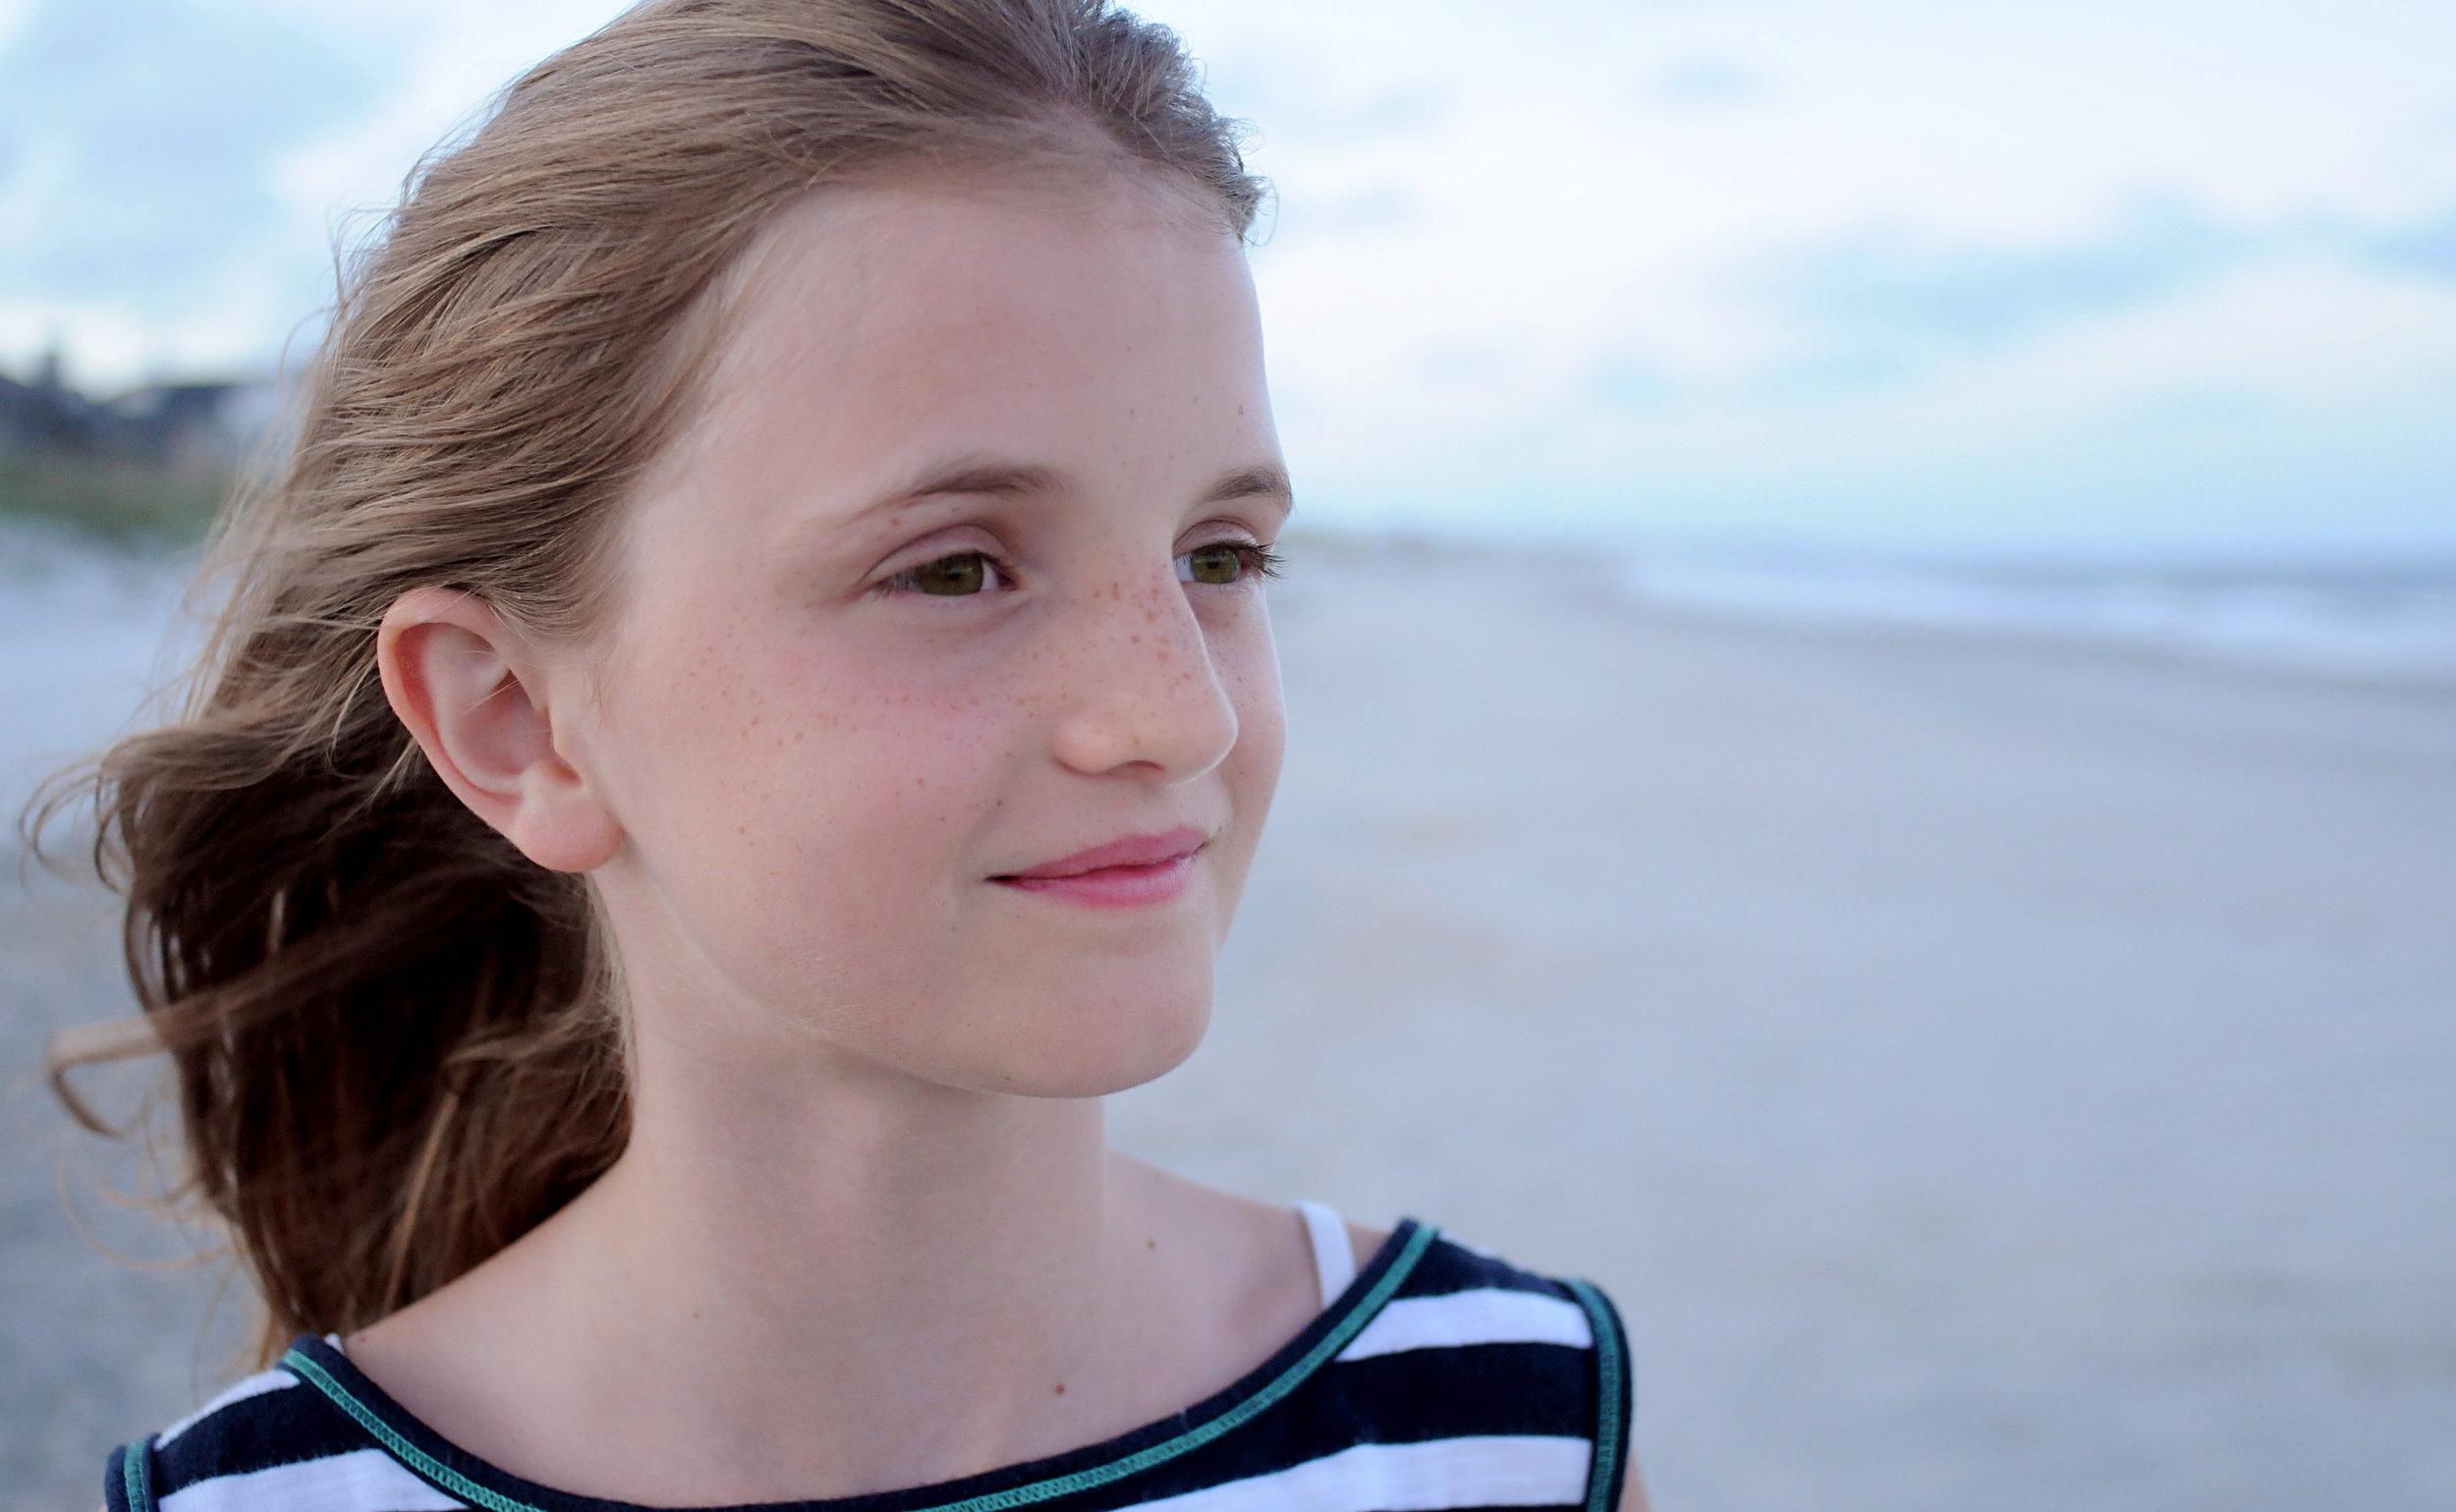 Julia, age 9 - Nina, Julia's mom, wrote: